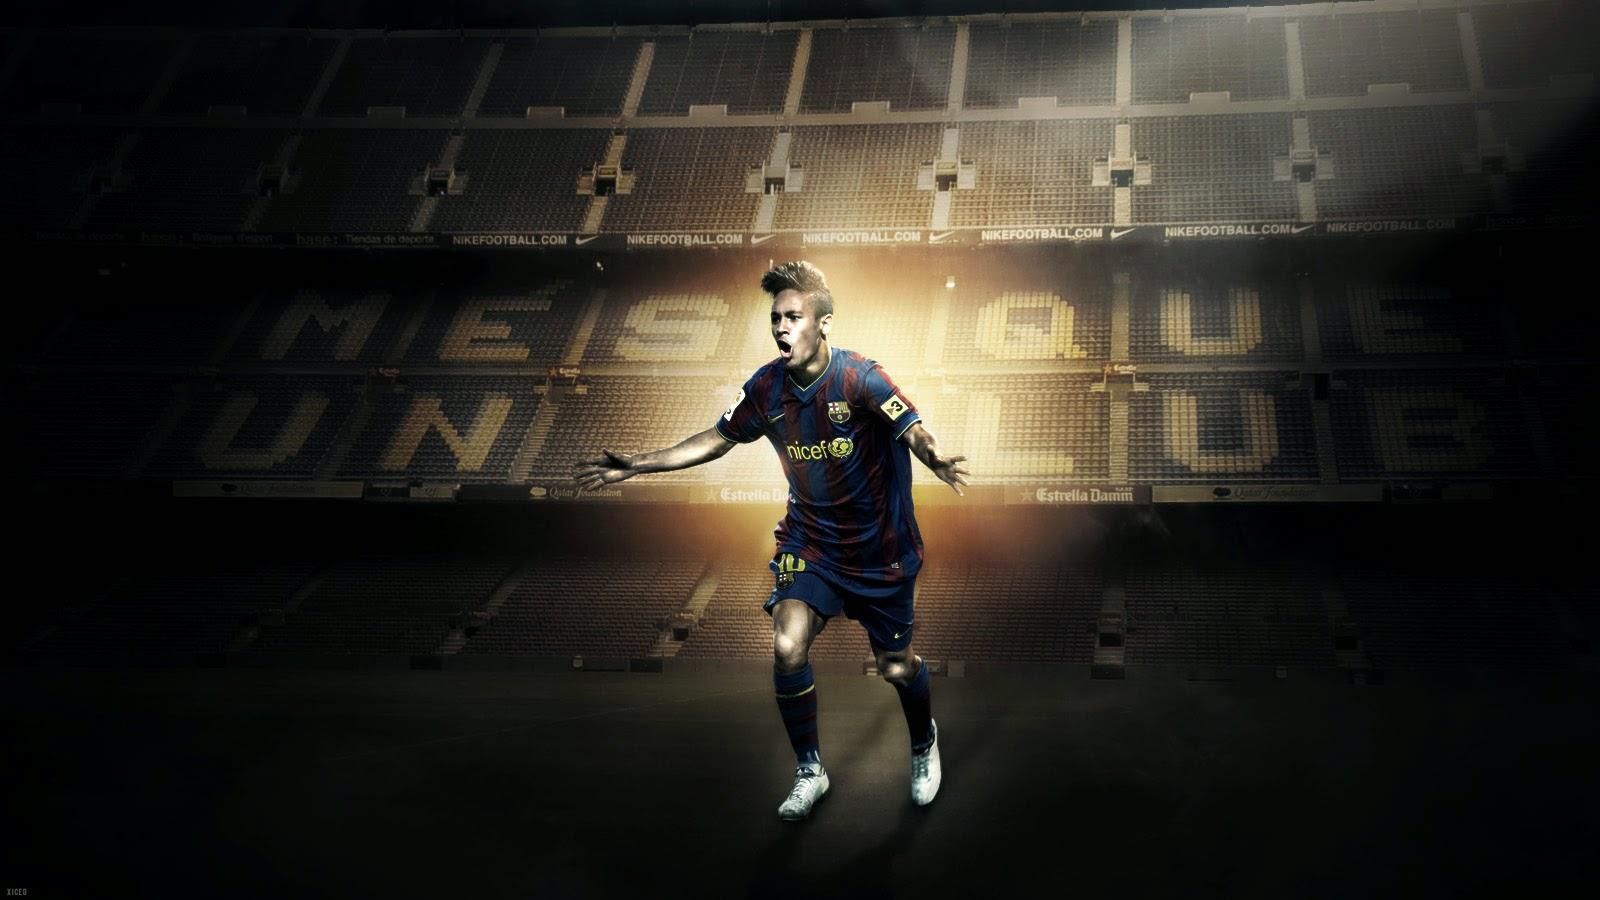 neymar full hd images